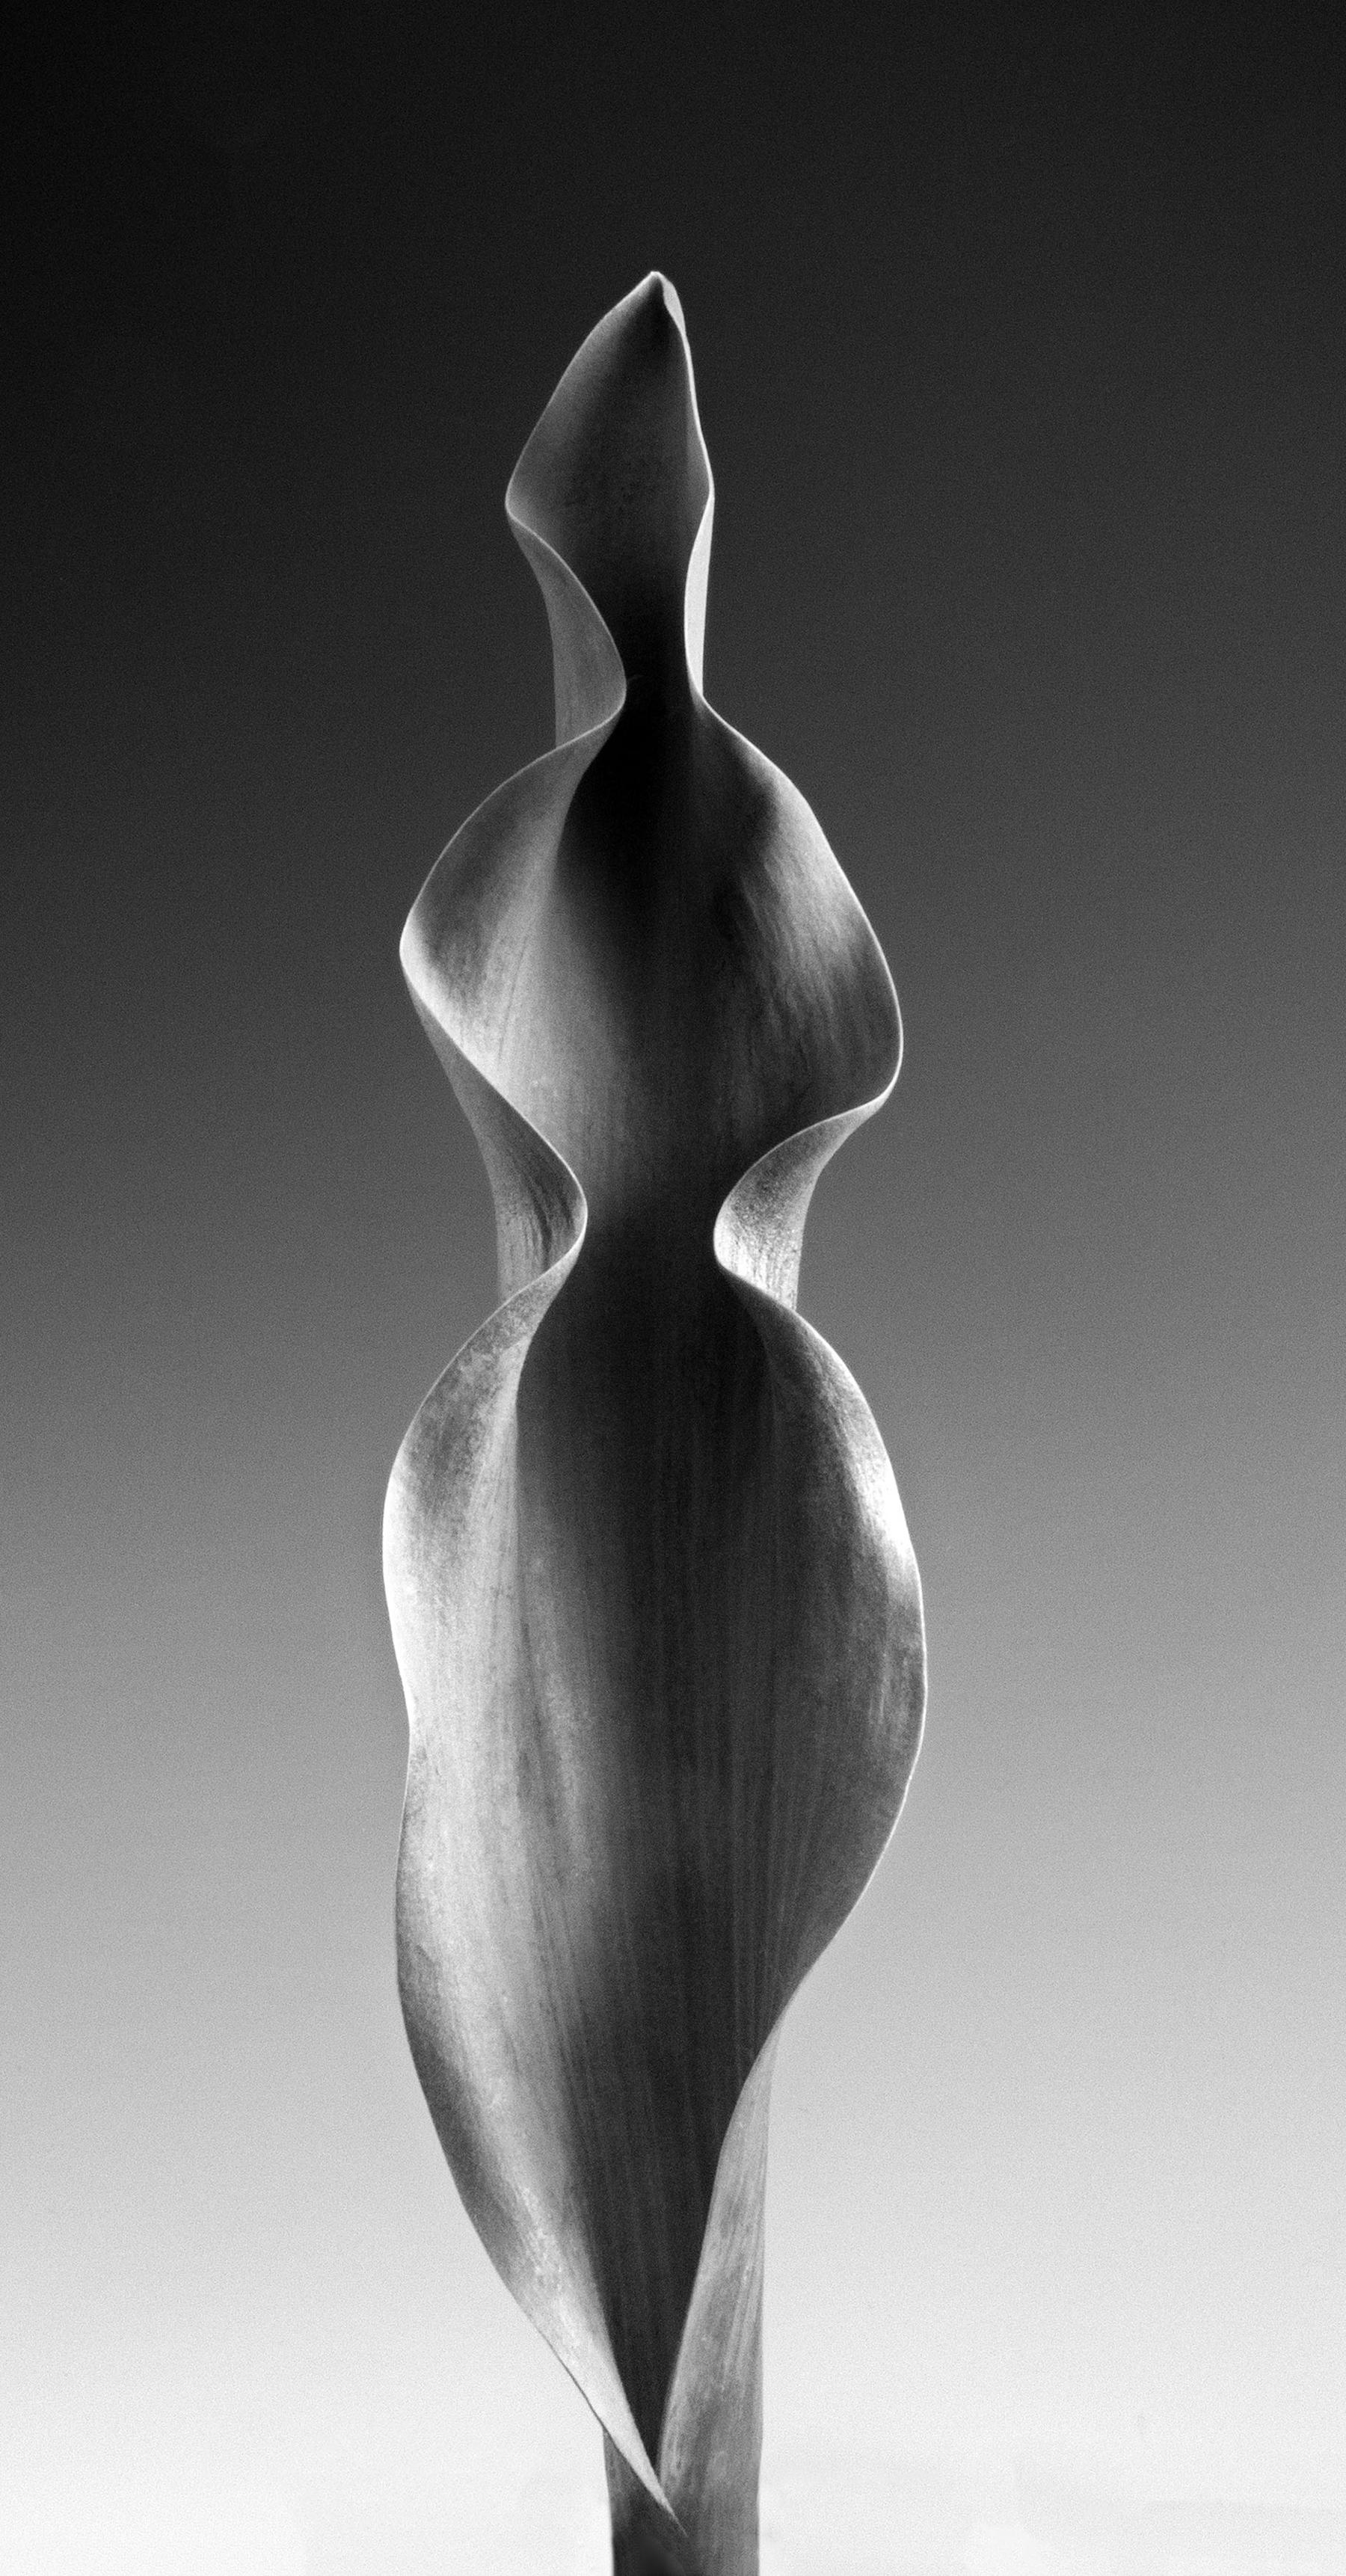 Carol-Lawrence-One-Beauty-Curved-Leaf-6-16.jpg